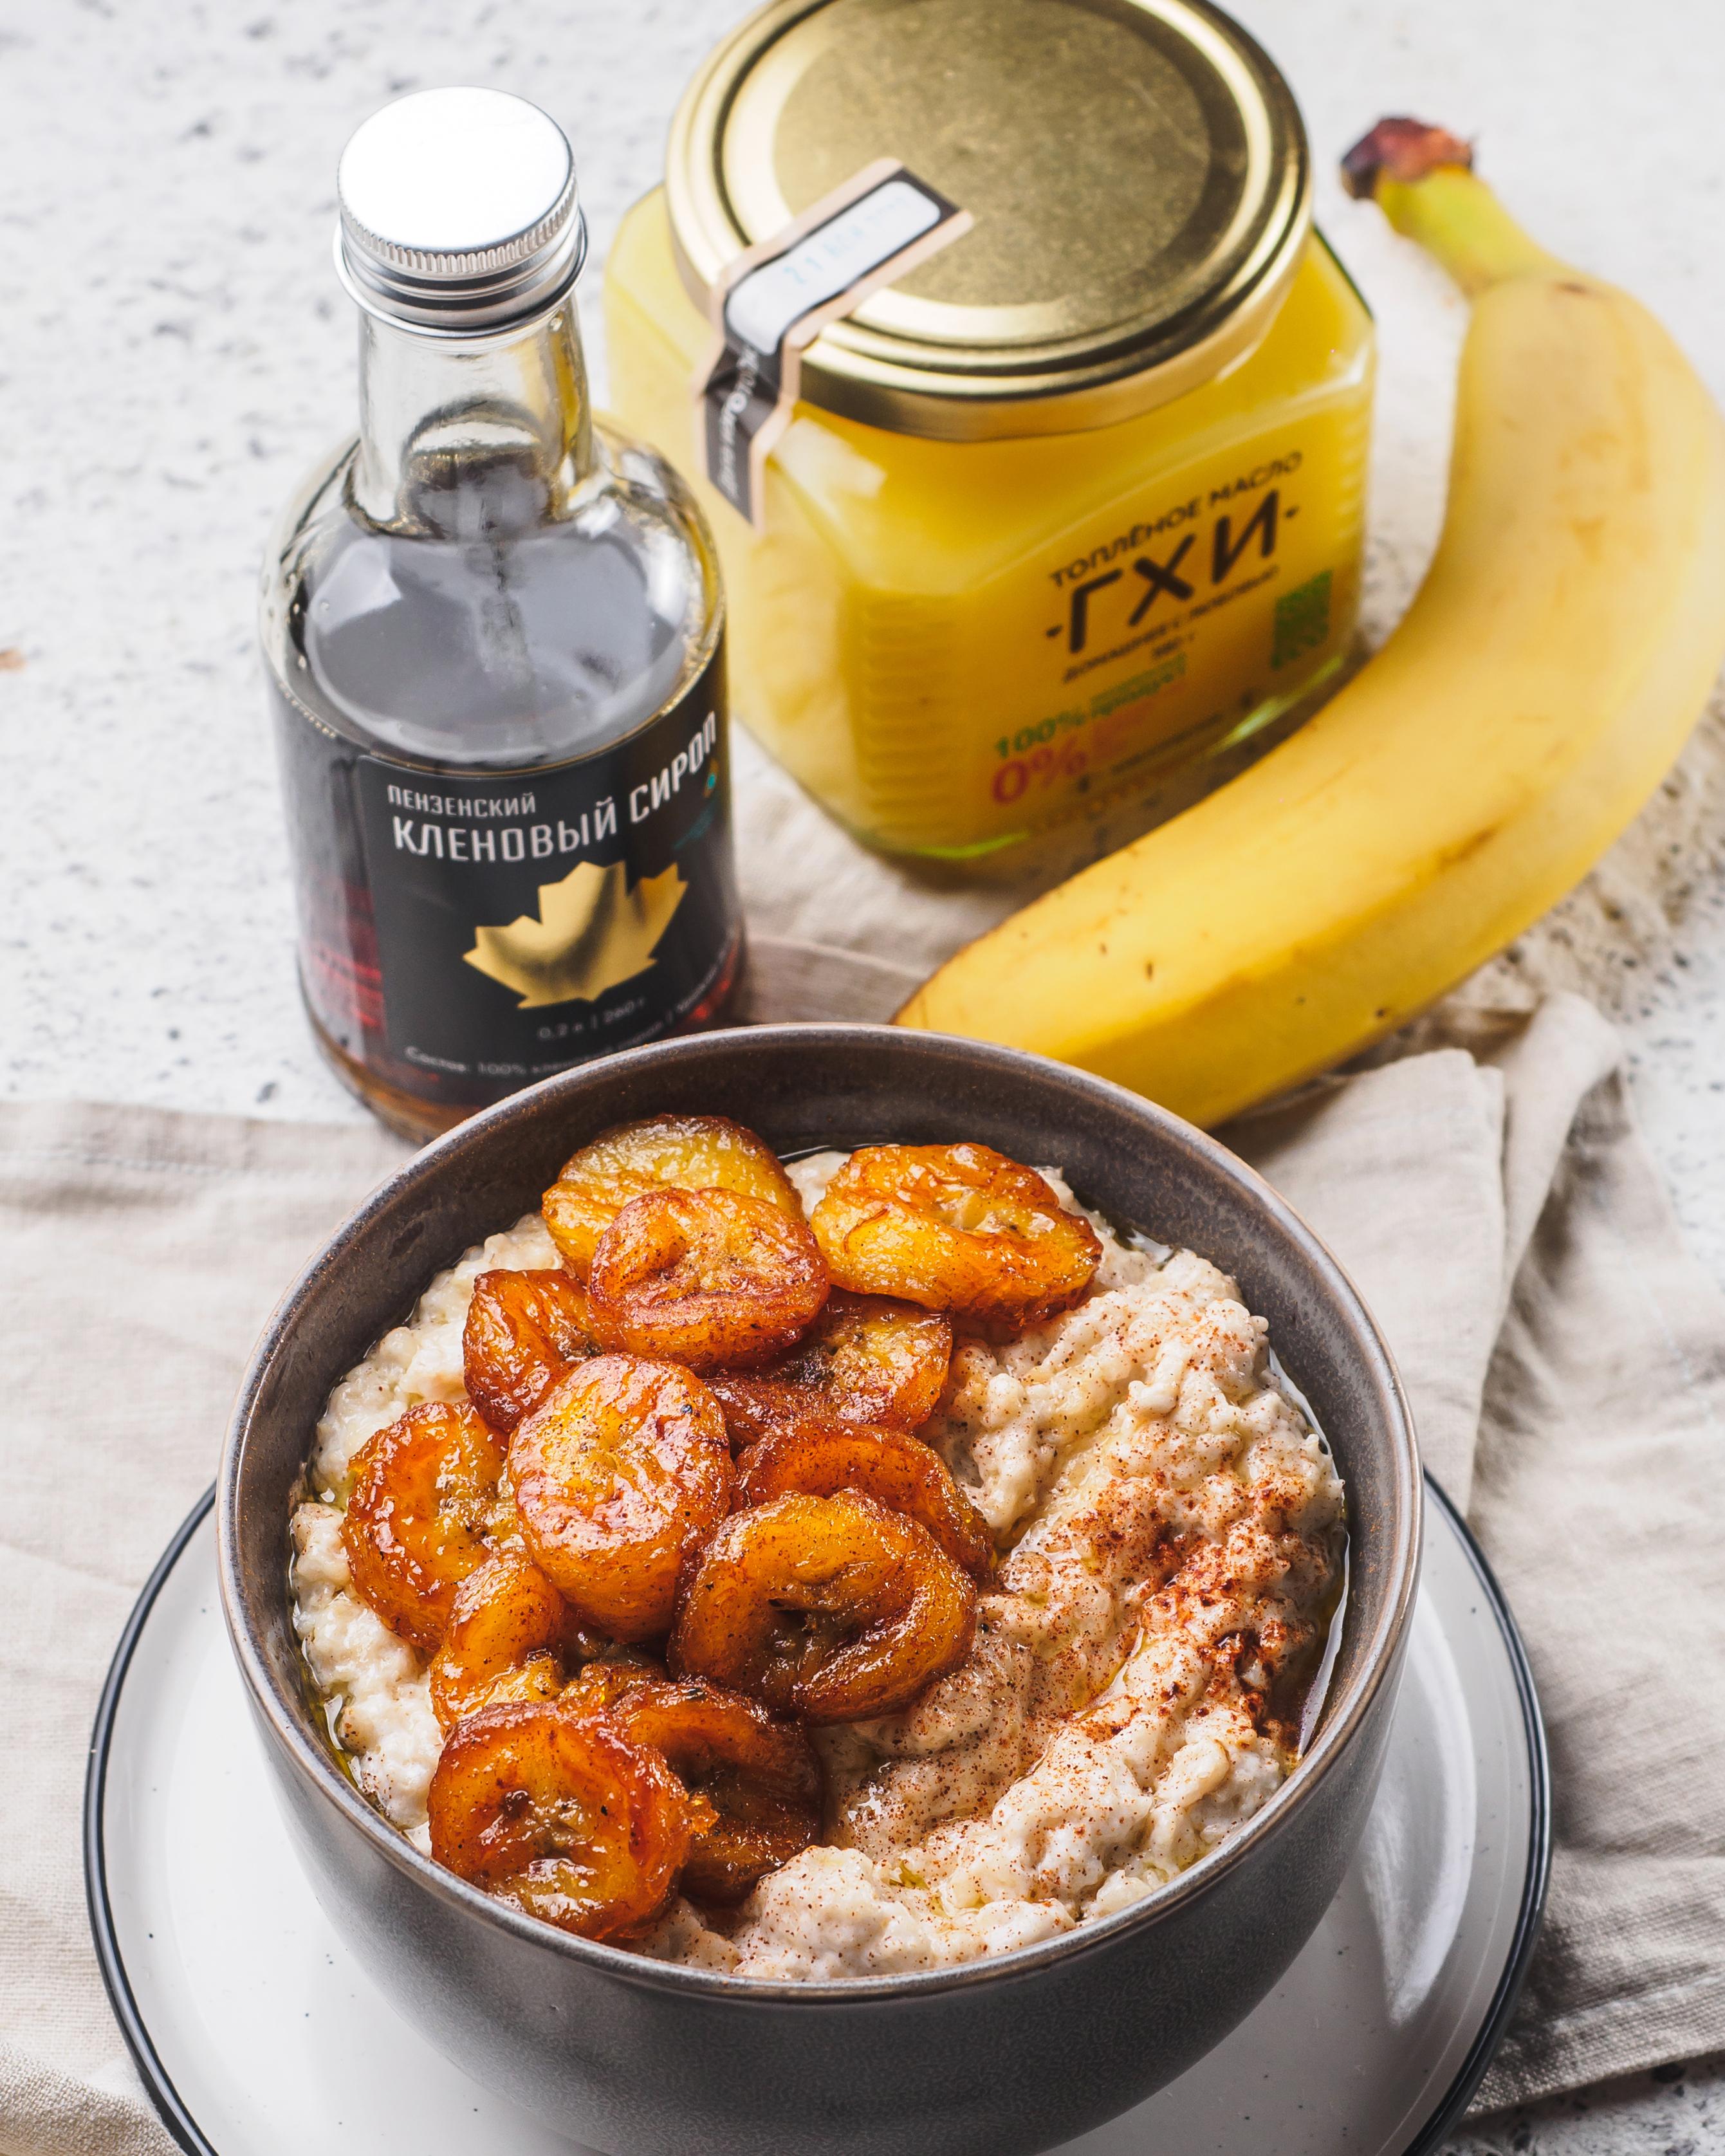 Рецепт полезного завтрака